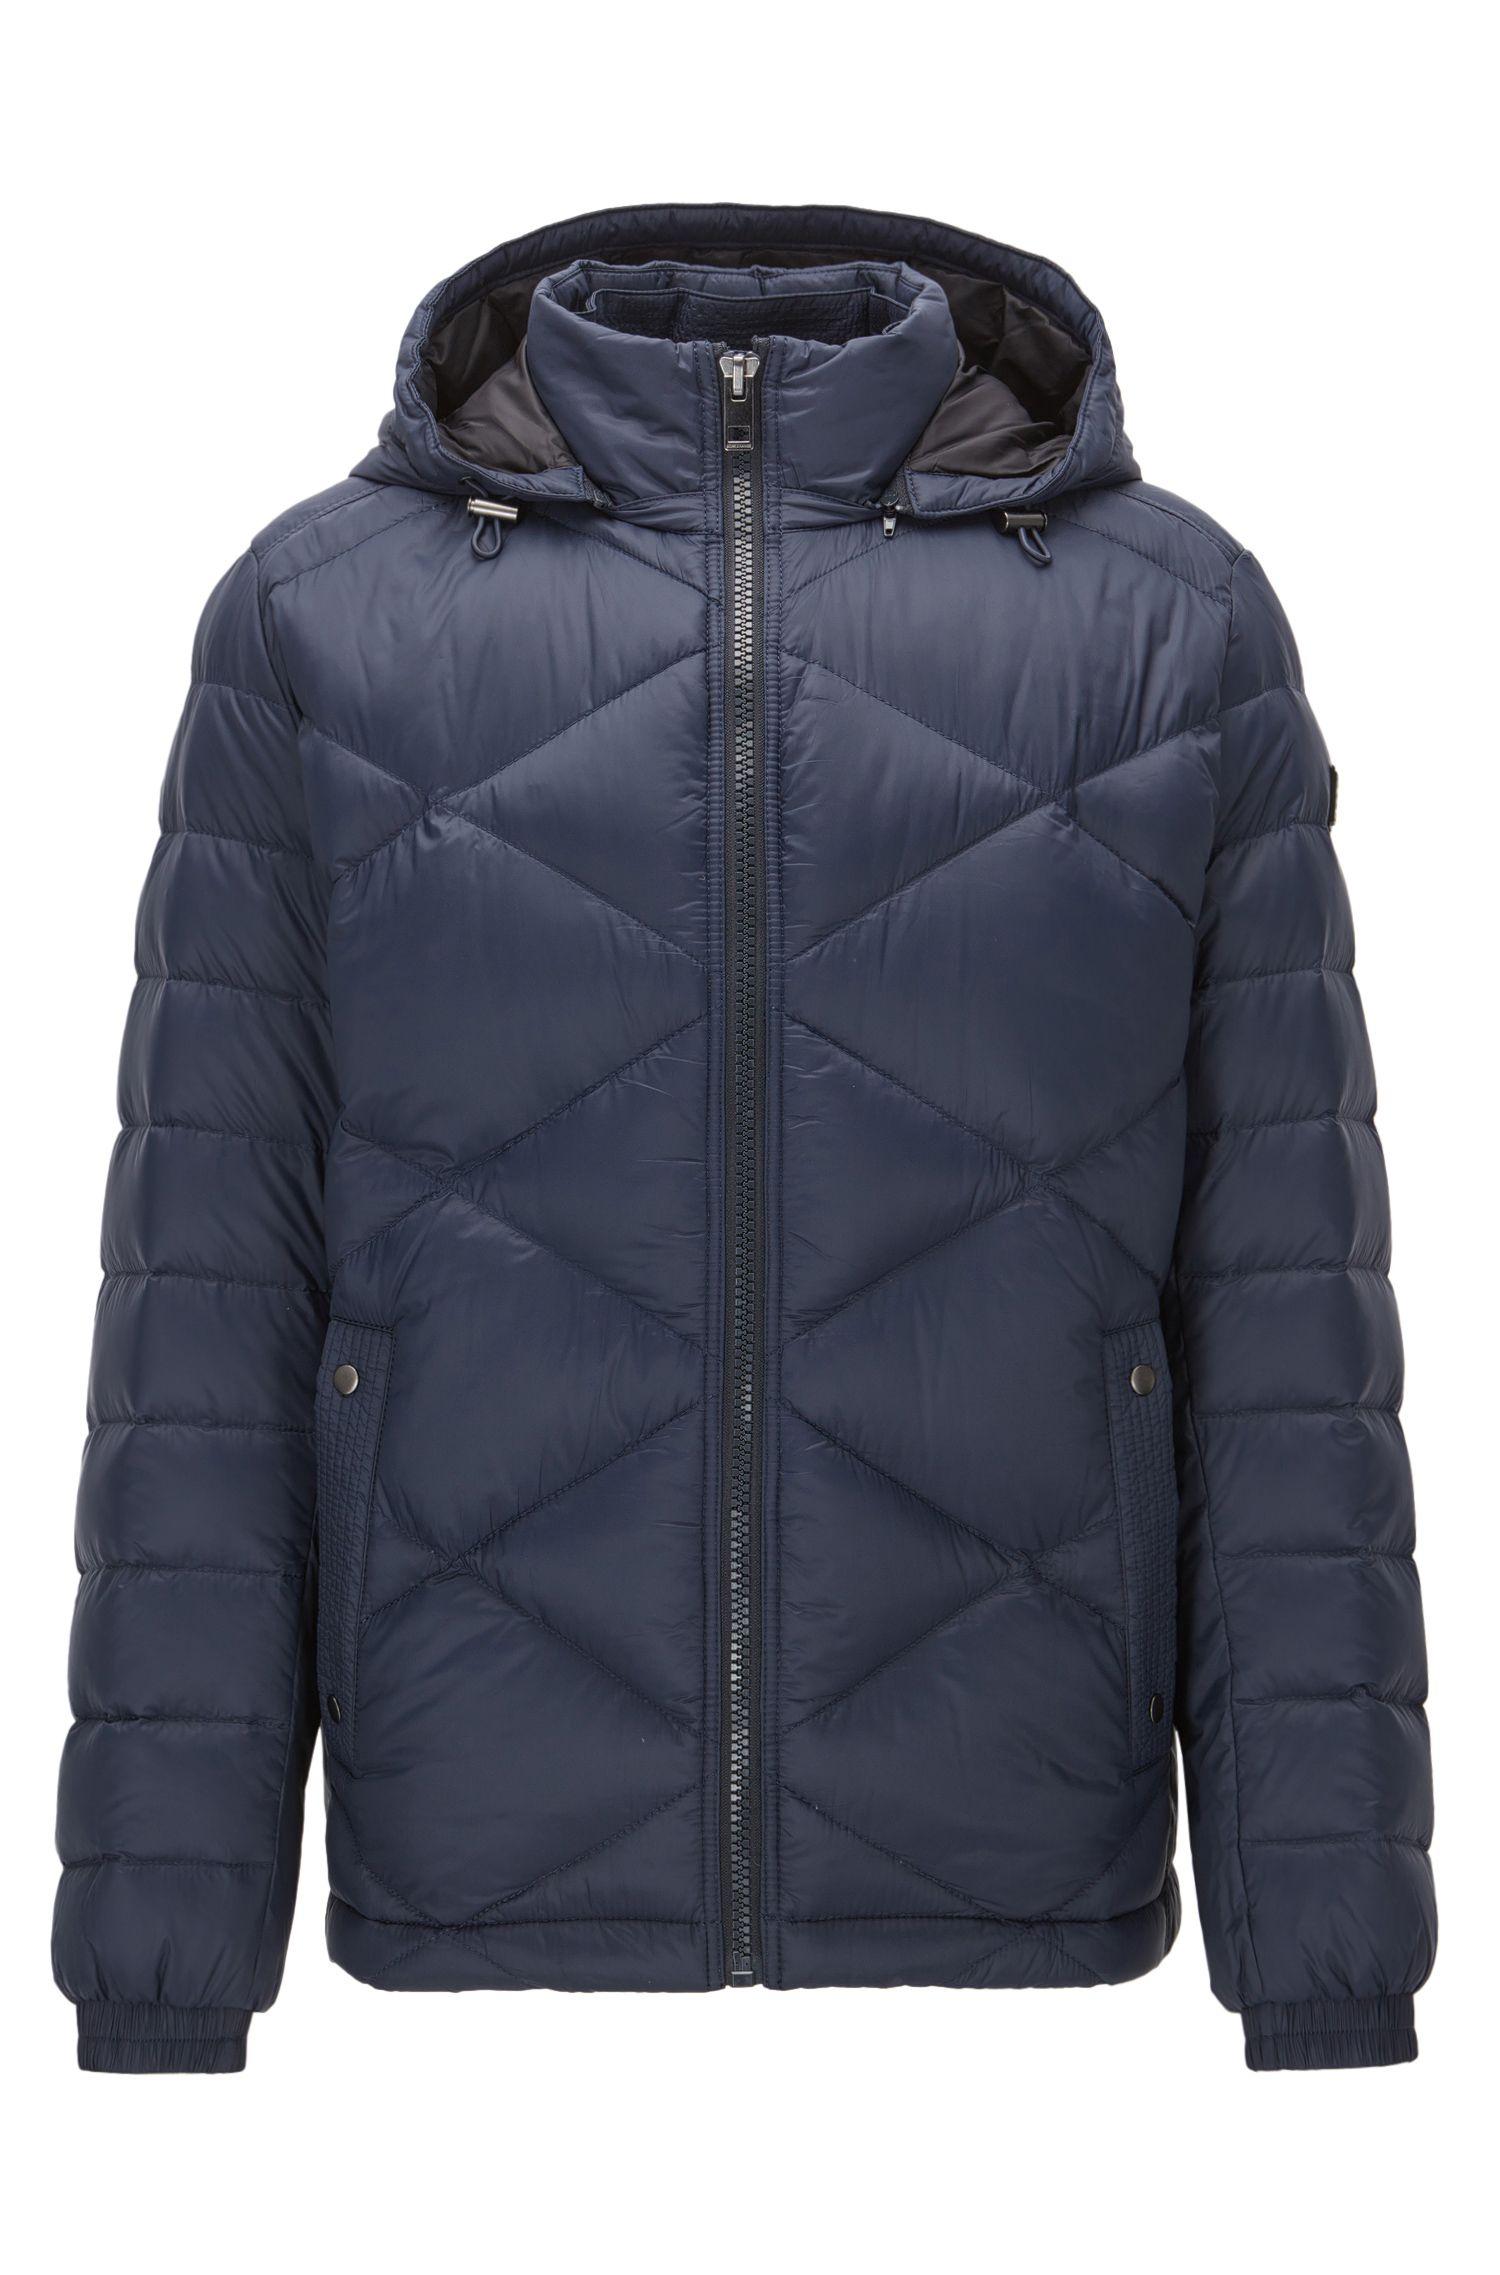 Regular-fit jacket in water-repellent fabric